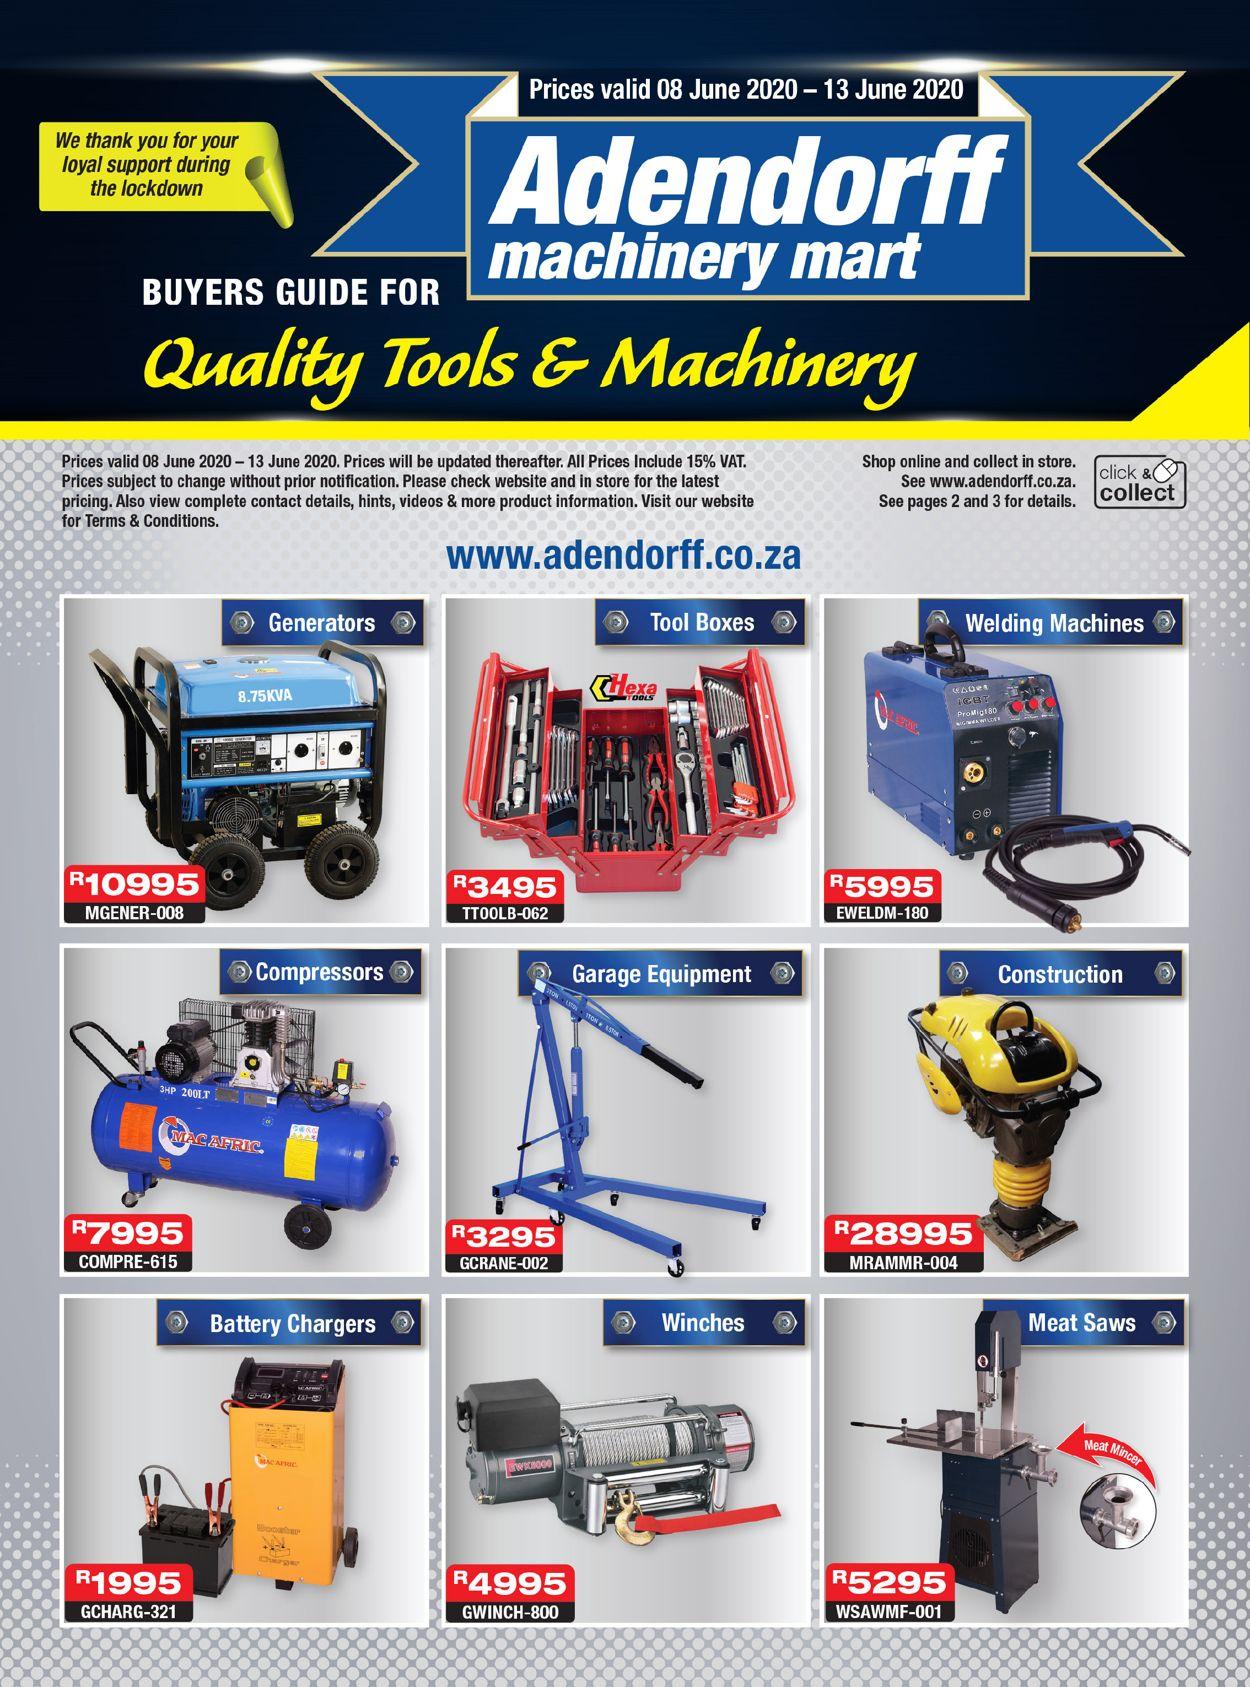 Adendorff Machinery Mart Catalogue - 2020/06/08-2020/06/13